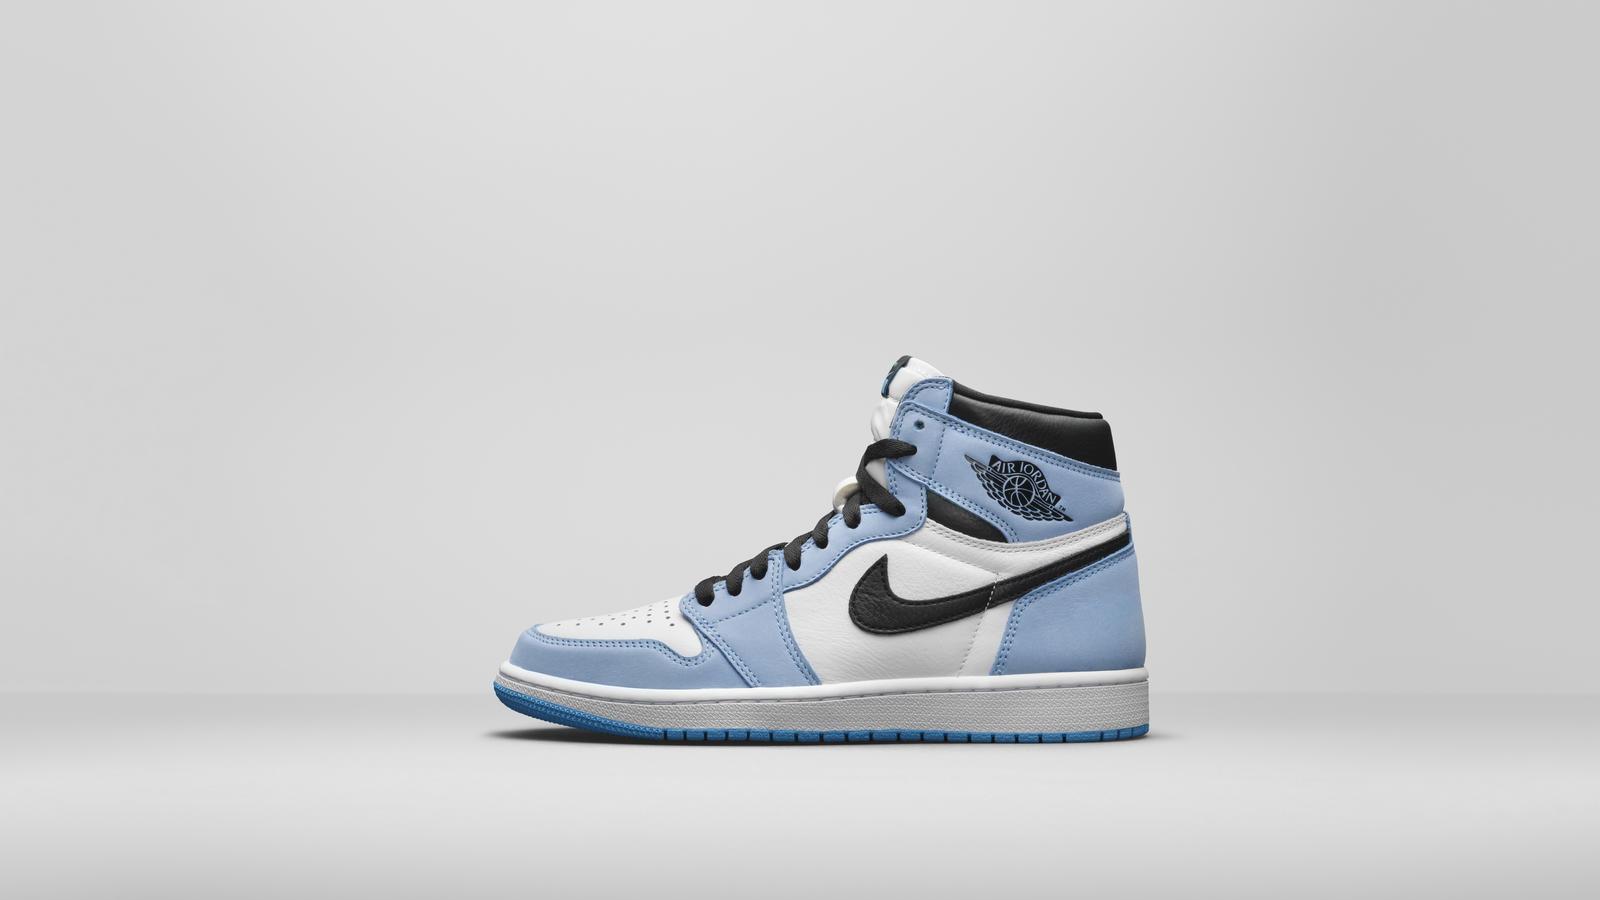 Jordan Brand Spring 2021 Retro Releases 3